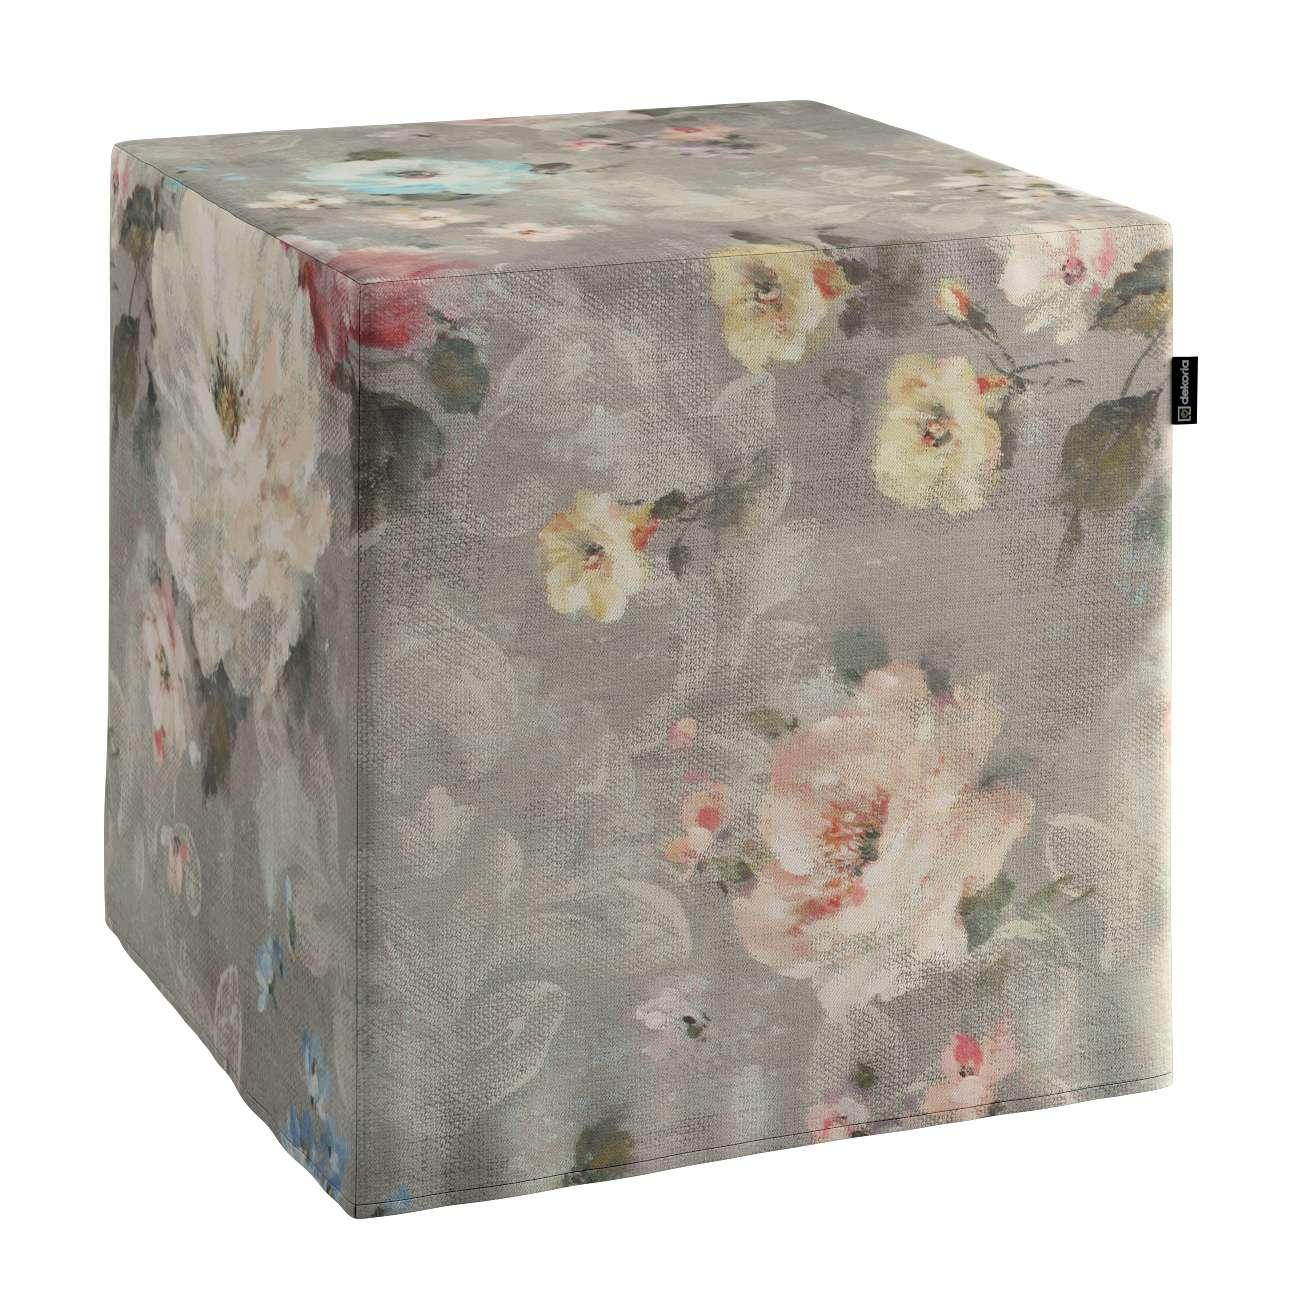 Sedák kostka - pevná 40x40x40 v kolekci Monet, látka: 137-81